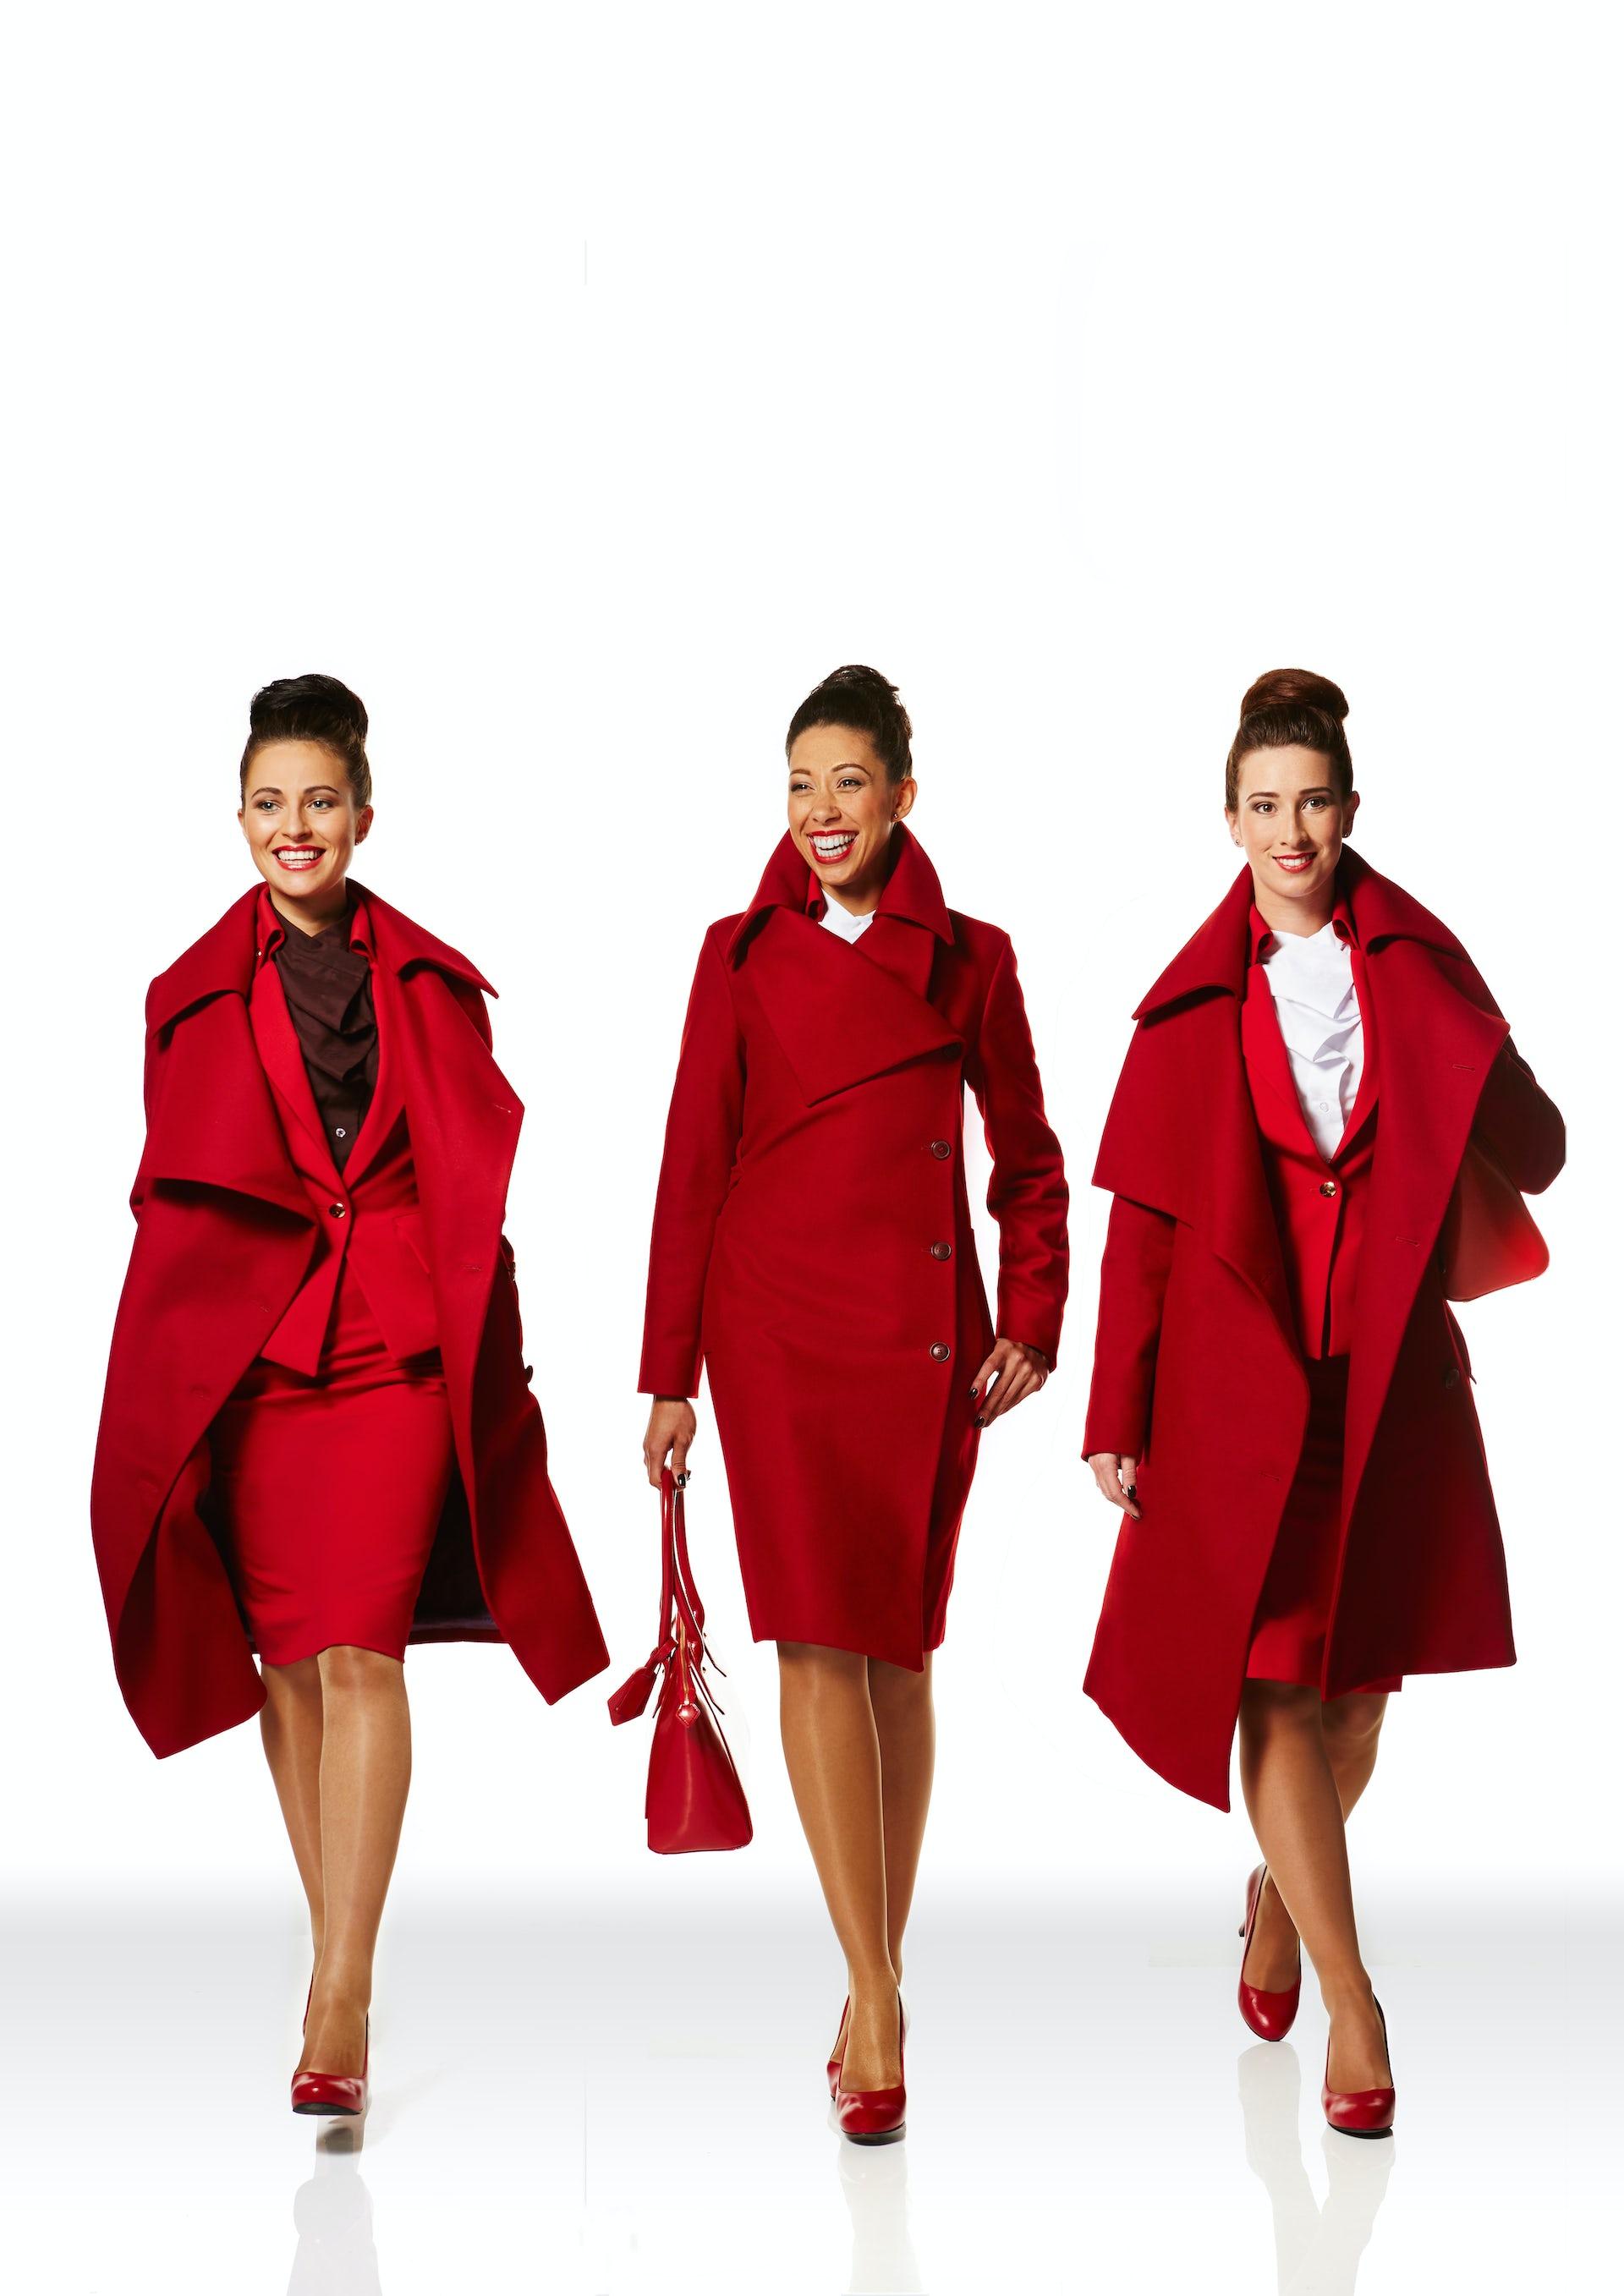 essay on air hostess Expert attorneys #infokime yuk kimers & laskar datang ke acara kode & pelatihan essay dg fasilitas & pembicara menarik tgl 21 oktober 2017 di c6 345.